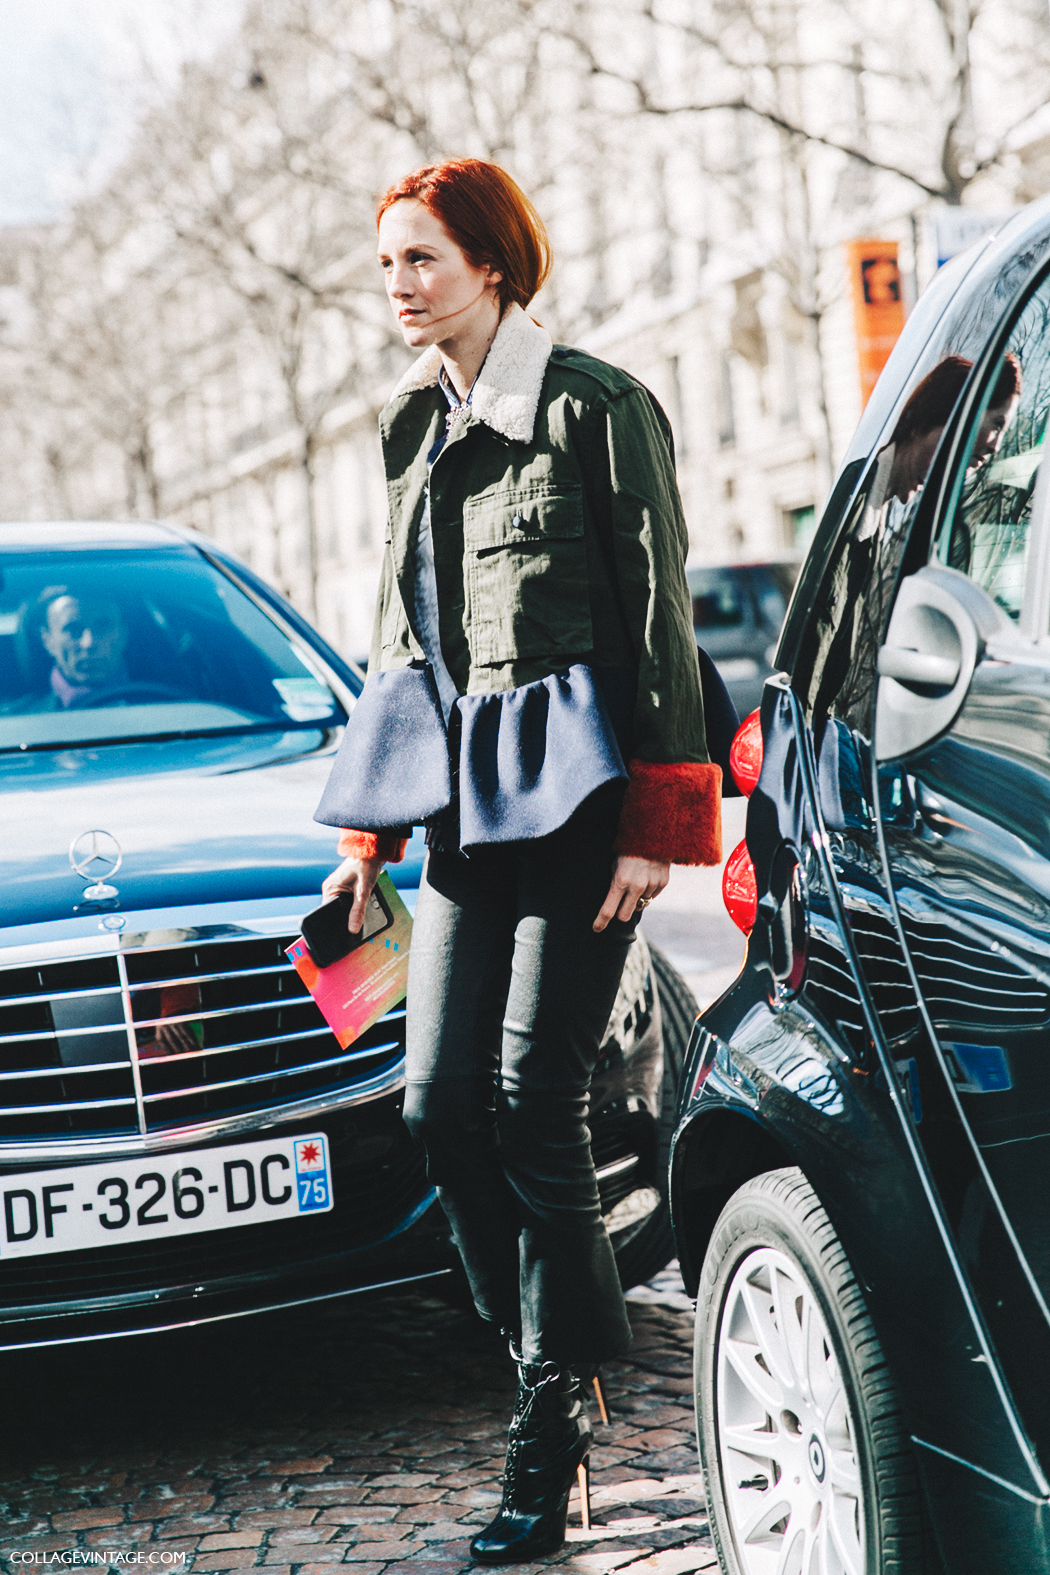 PFW-Paris_Fashion_Week_Fall_2016-Street_Style-Collage_Vintage-Taylor_Tomasi_Hill-2